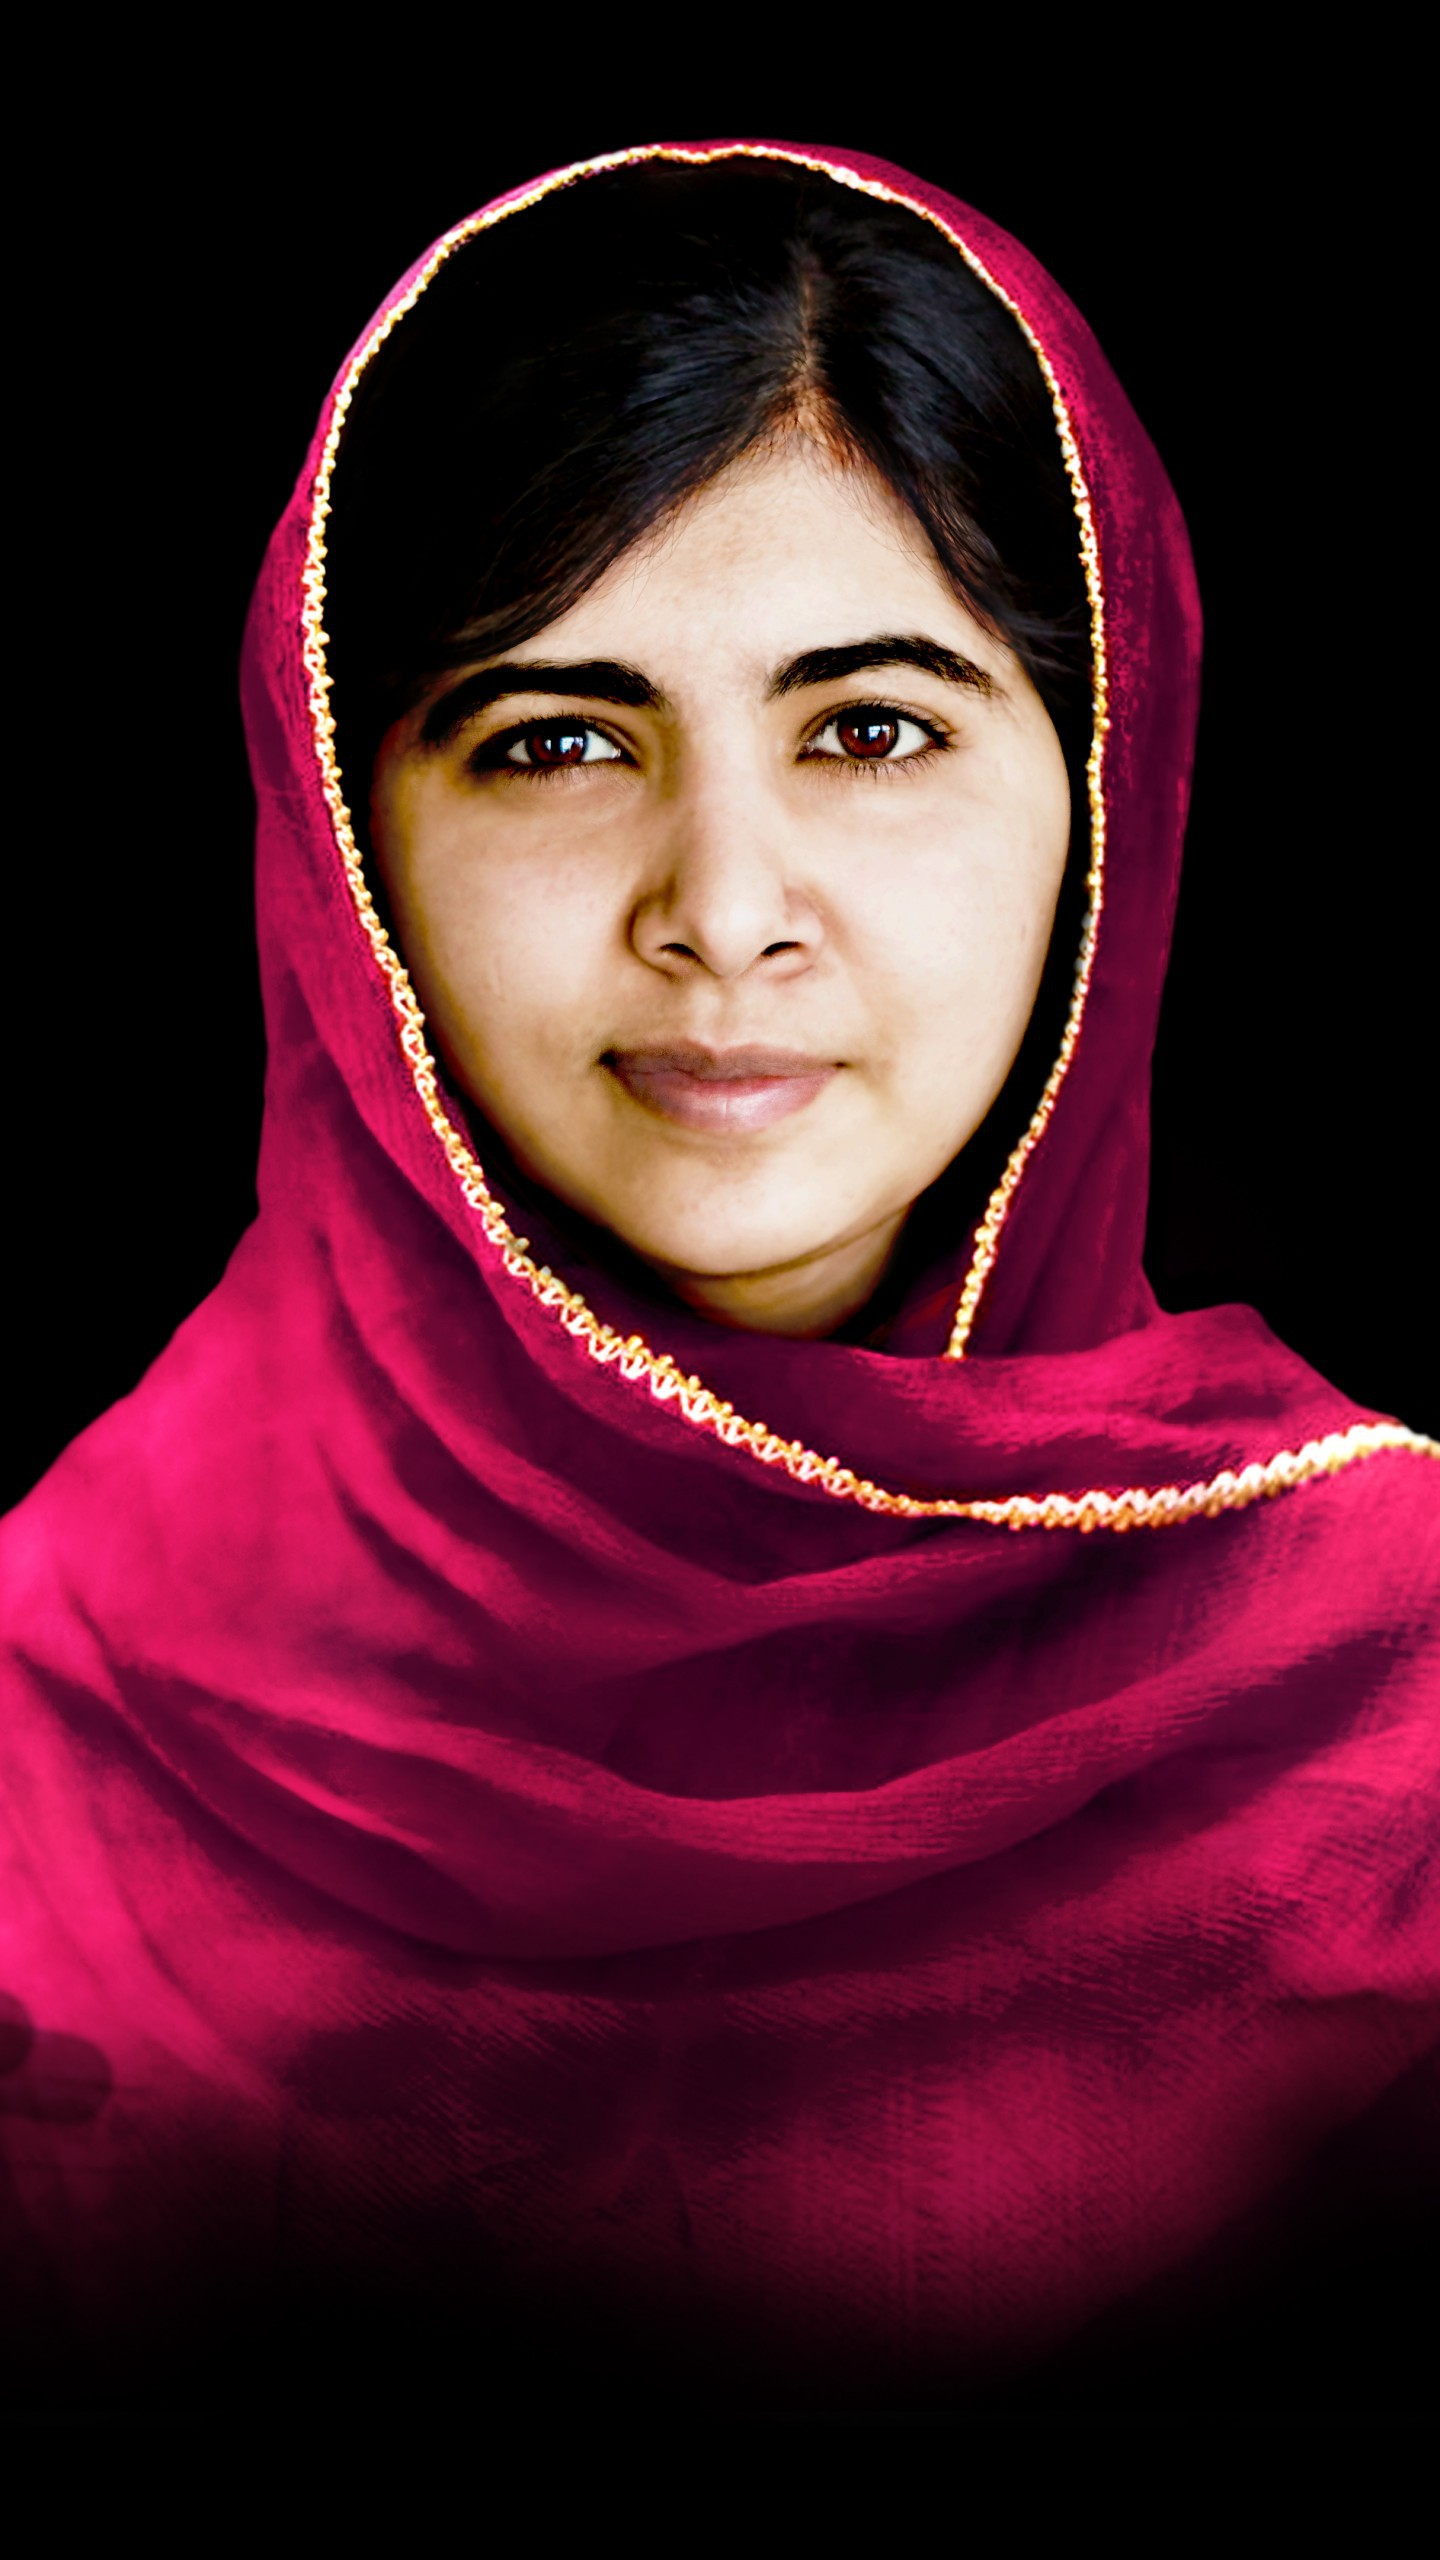 عکس زمینه ملاله یوسفزی فعال پاکستانی برنده جایزه نوبل پس زمینه